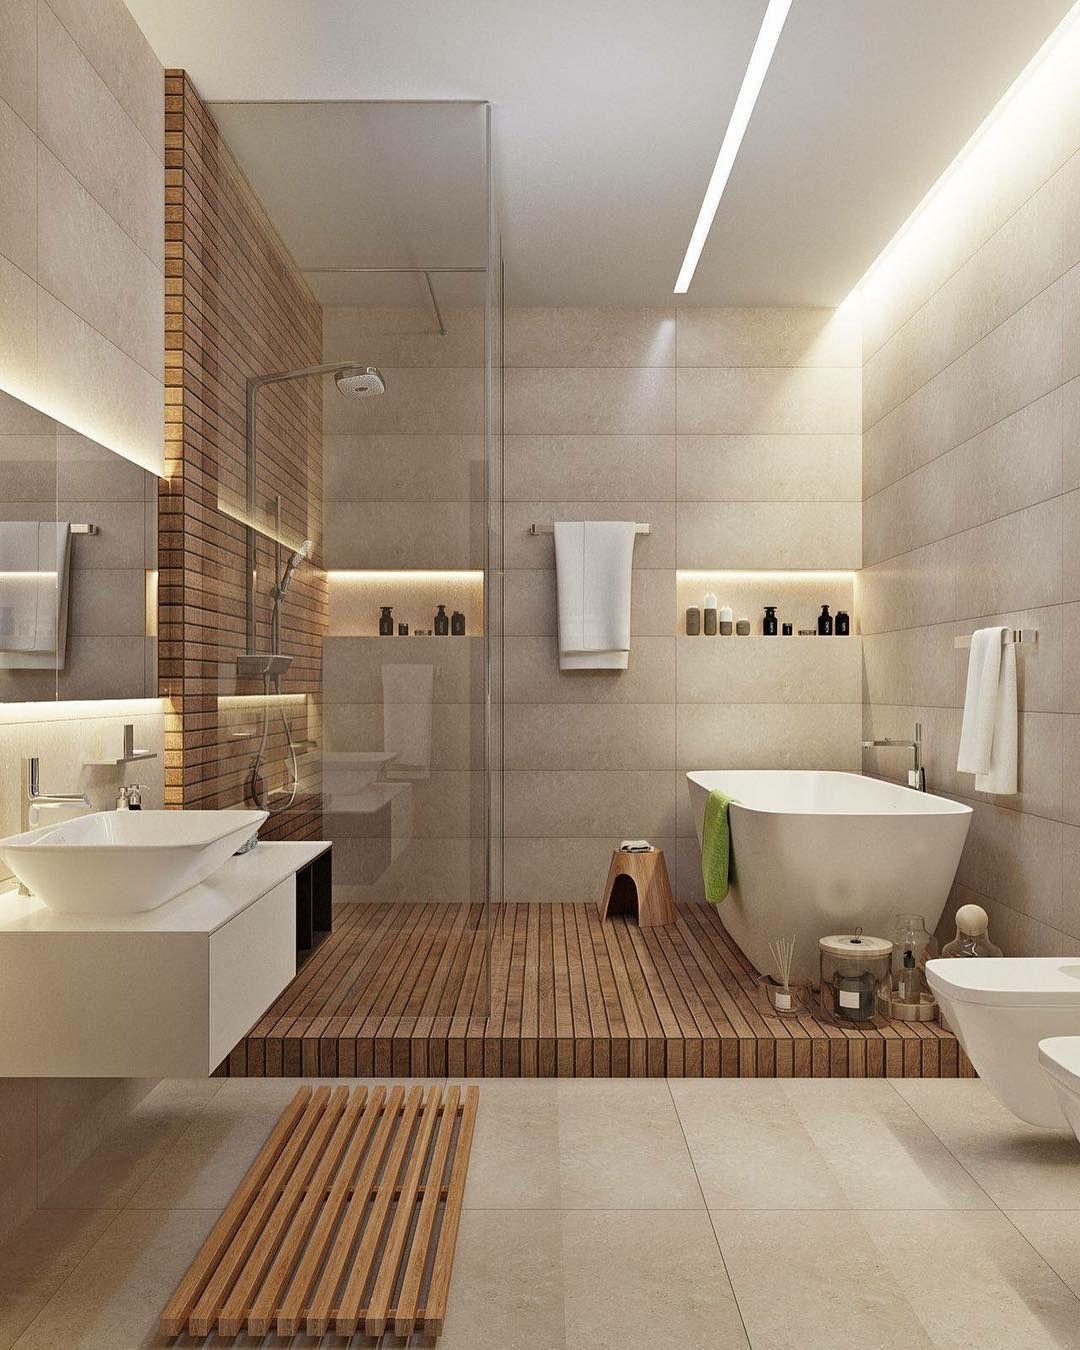 Adorable 100 Great Minimalist Modern Bathroom Ideashttps Homeofpondo Com 100 Great Minimalist M Bathroom Design Small Modern Bathroom Design Bathroom Design Minimalist luxury small bathroom